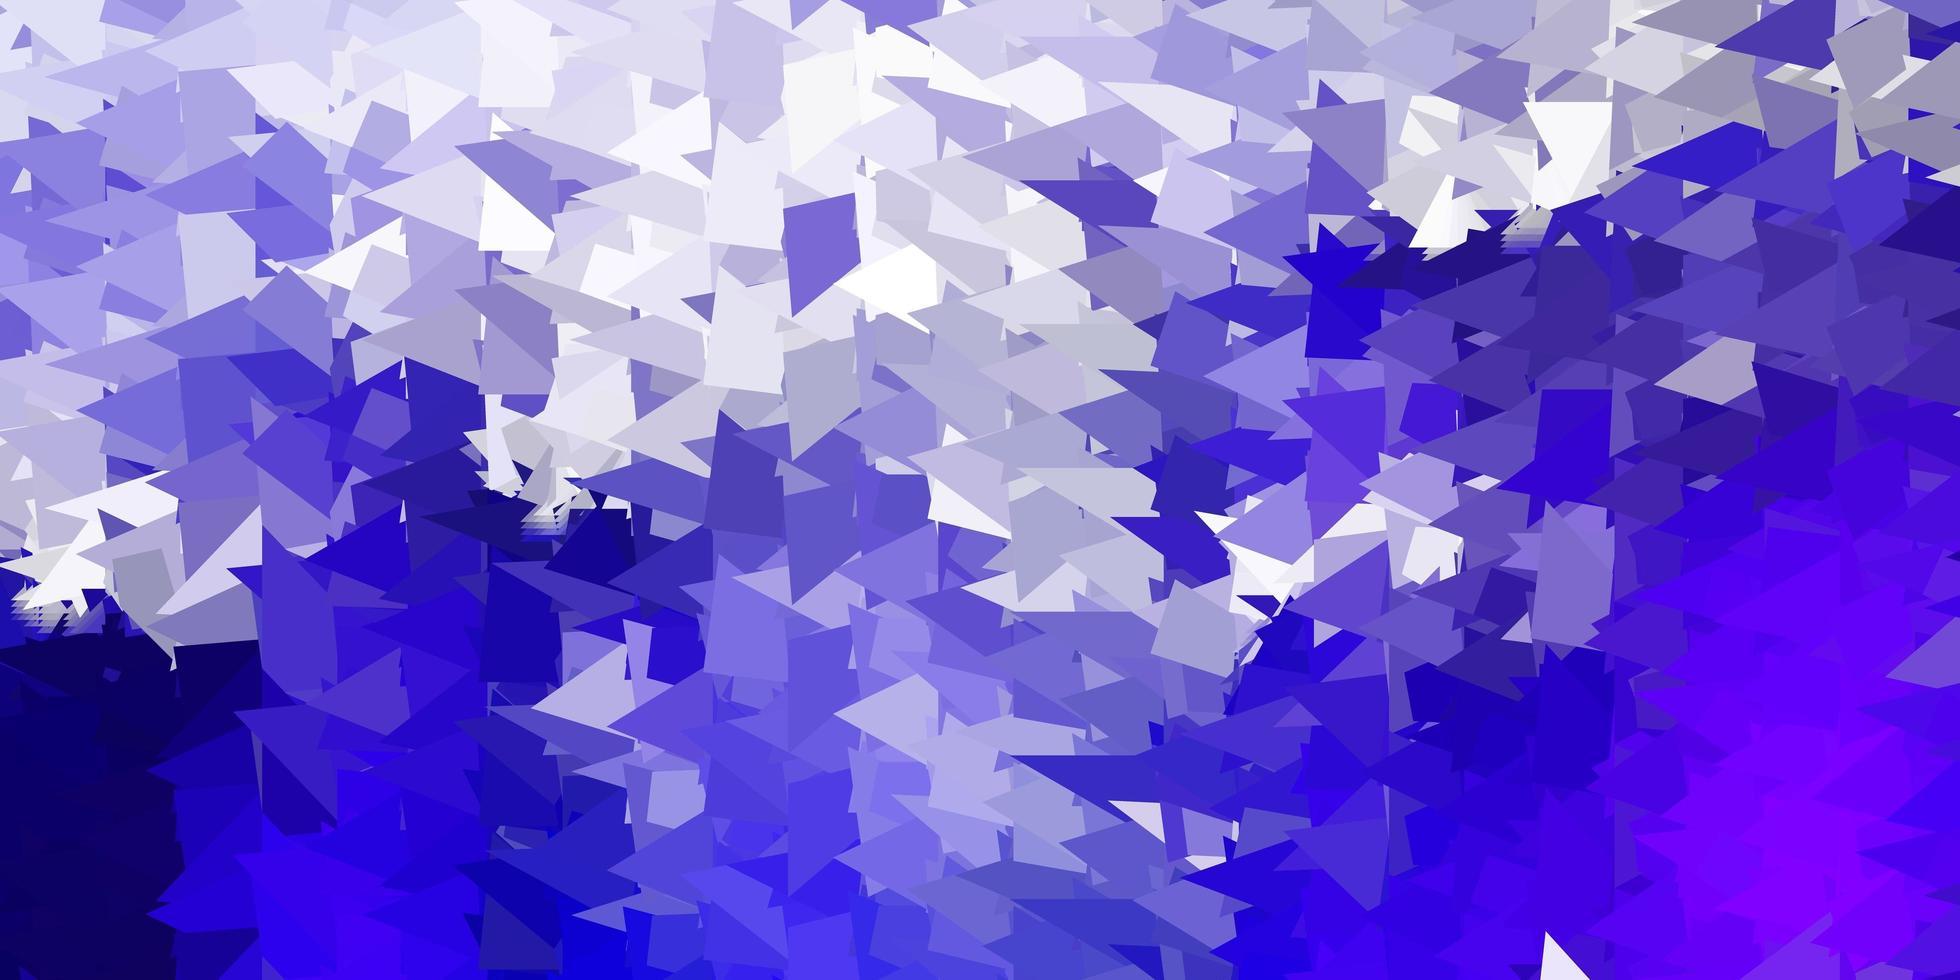 dunkelvioletter Vektor-Dreieck-Mosaik-Hintergrund. vektor